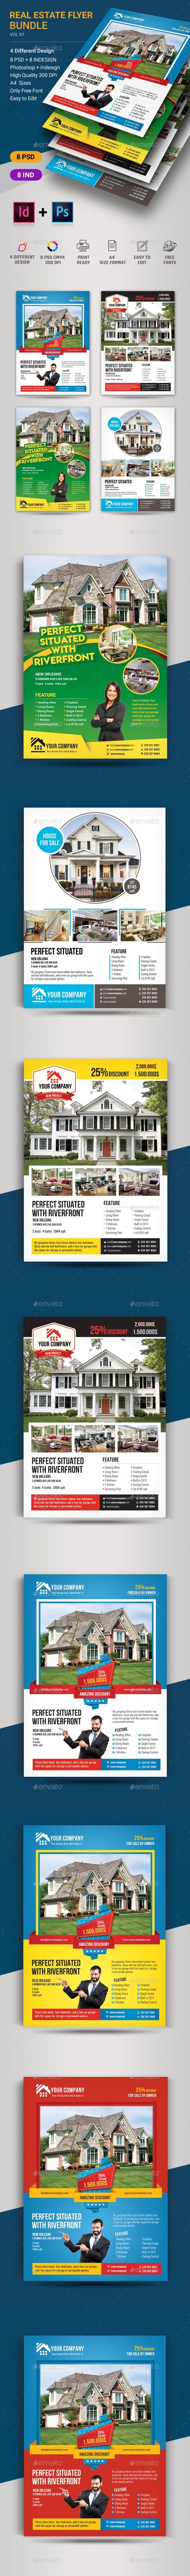 Real Estate Flyer Bundle - Corporate Business Cards